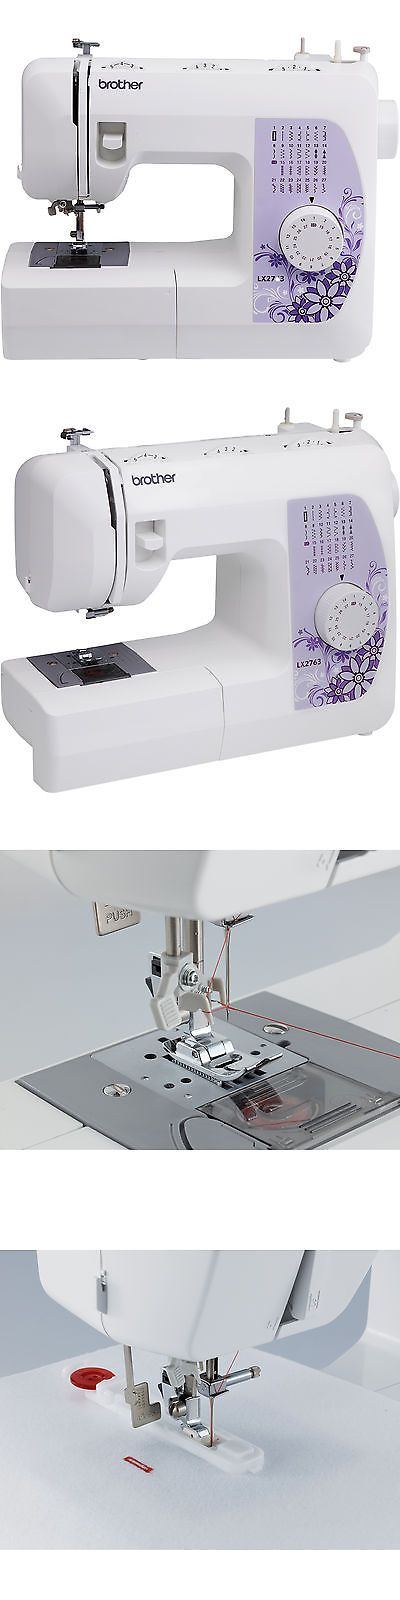 Brother 40Stitch Sewing Machine LX4063 Sewing Machines And Cool Brother 27 Stitch Sewing Machine